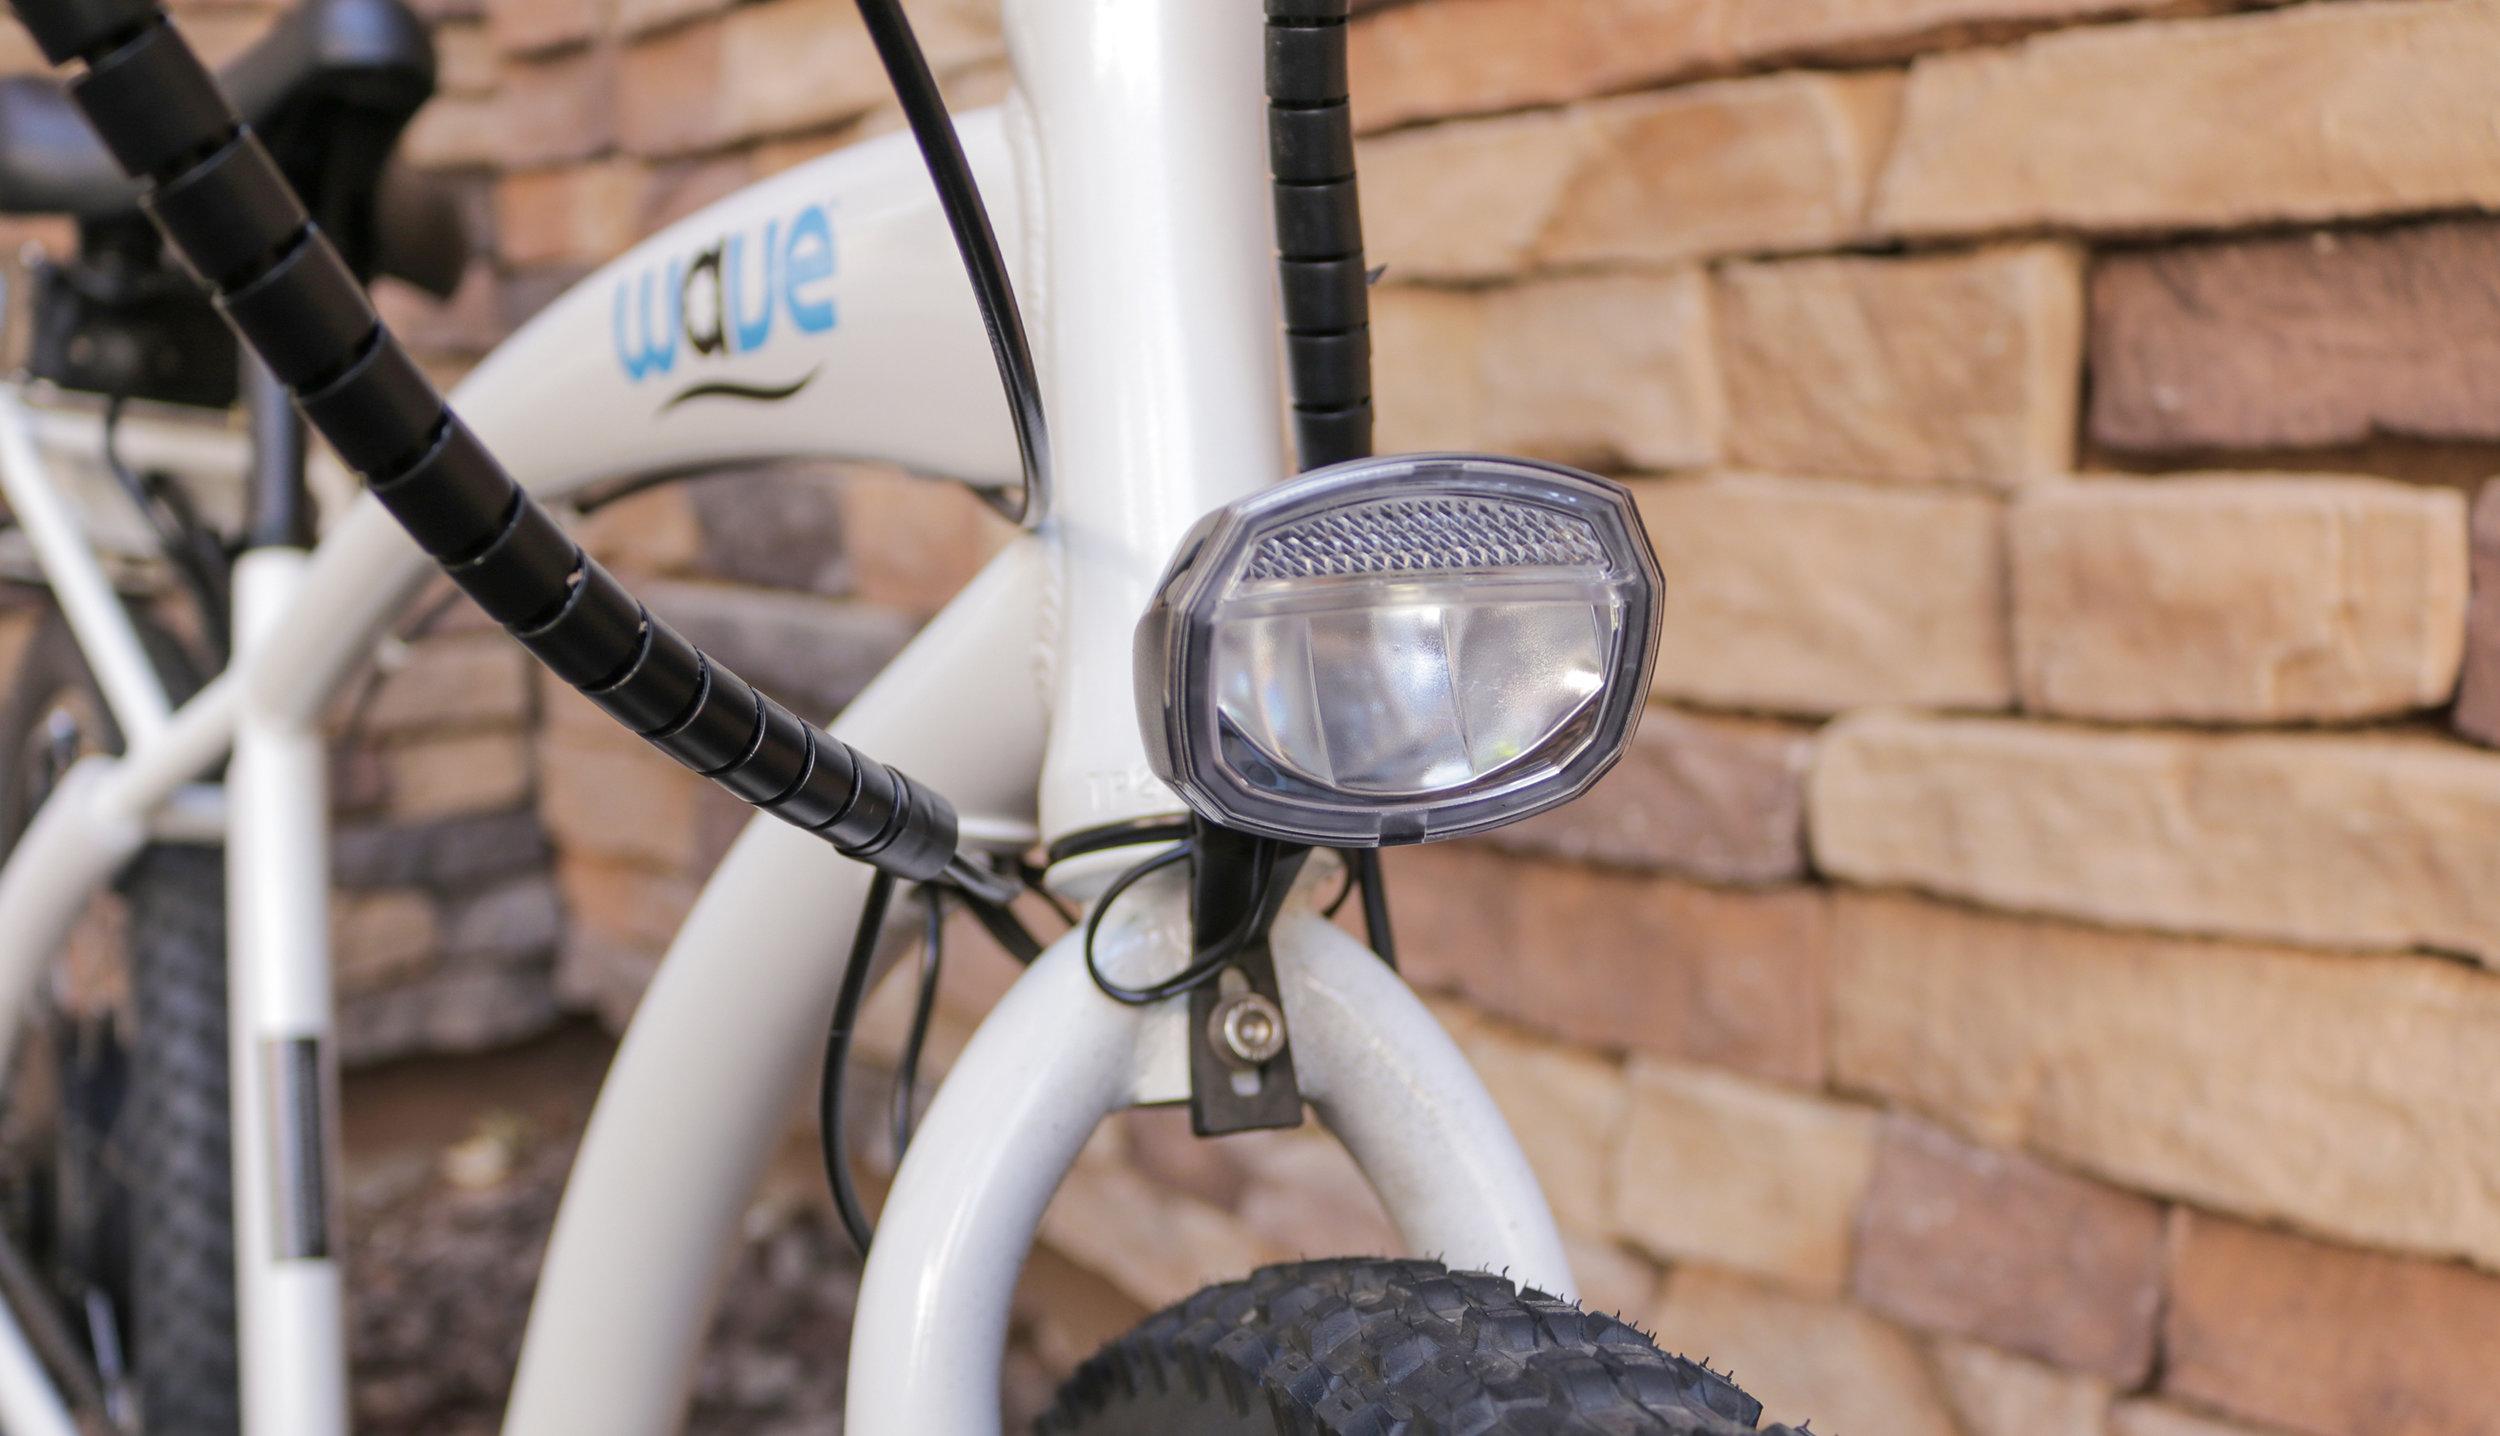 electrified-reviews-wave-electric-bike-review-headlight-3.jpg